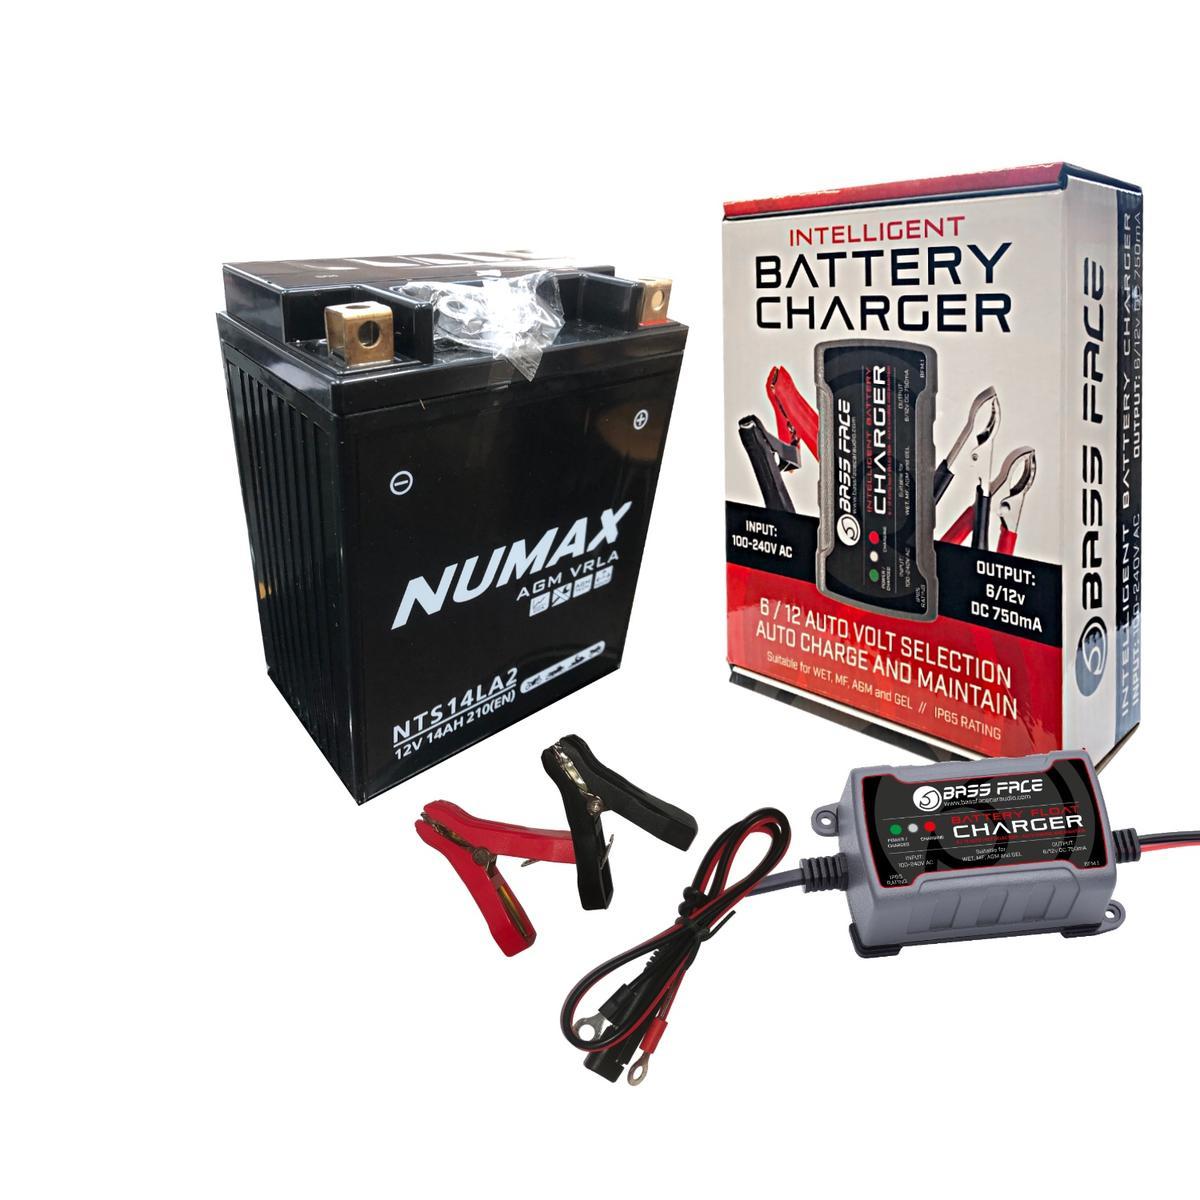 Numax NTS14LA2 MotorBike Motorcycle Battery Replaces 12N14-3A YB14L-A2 CB14L-A2